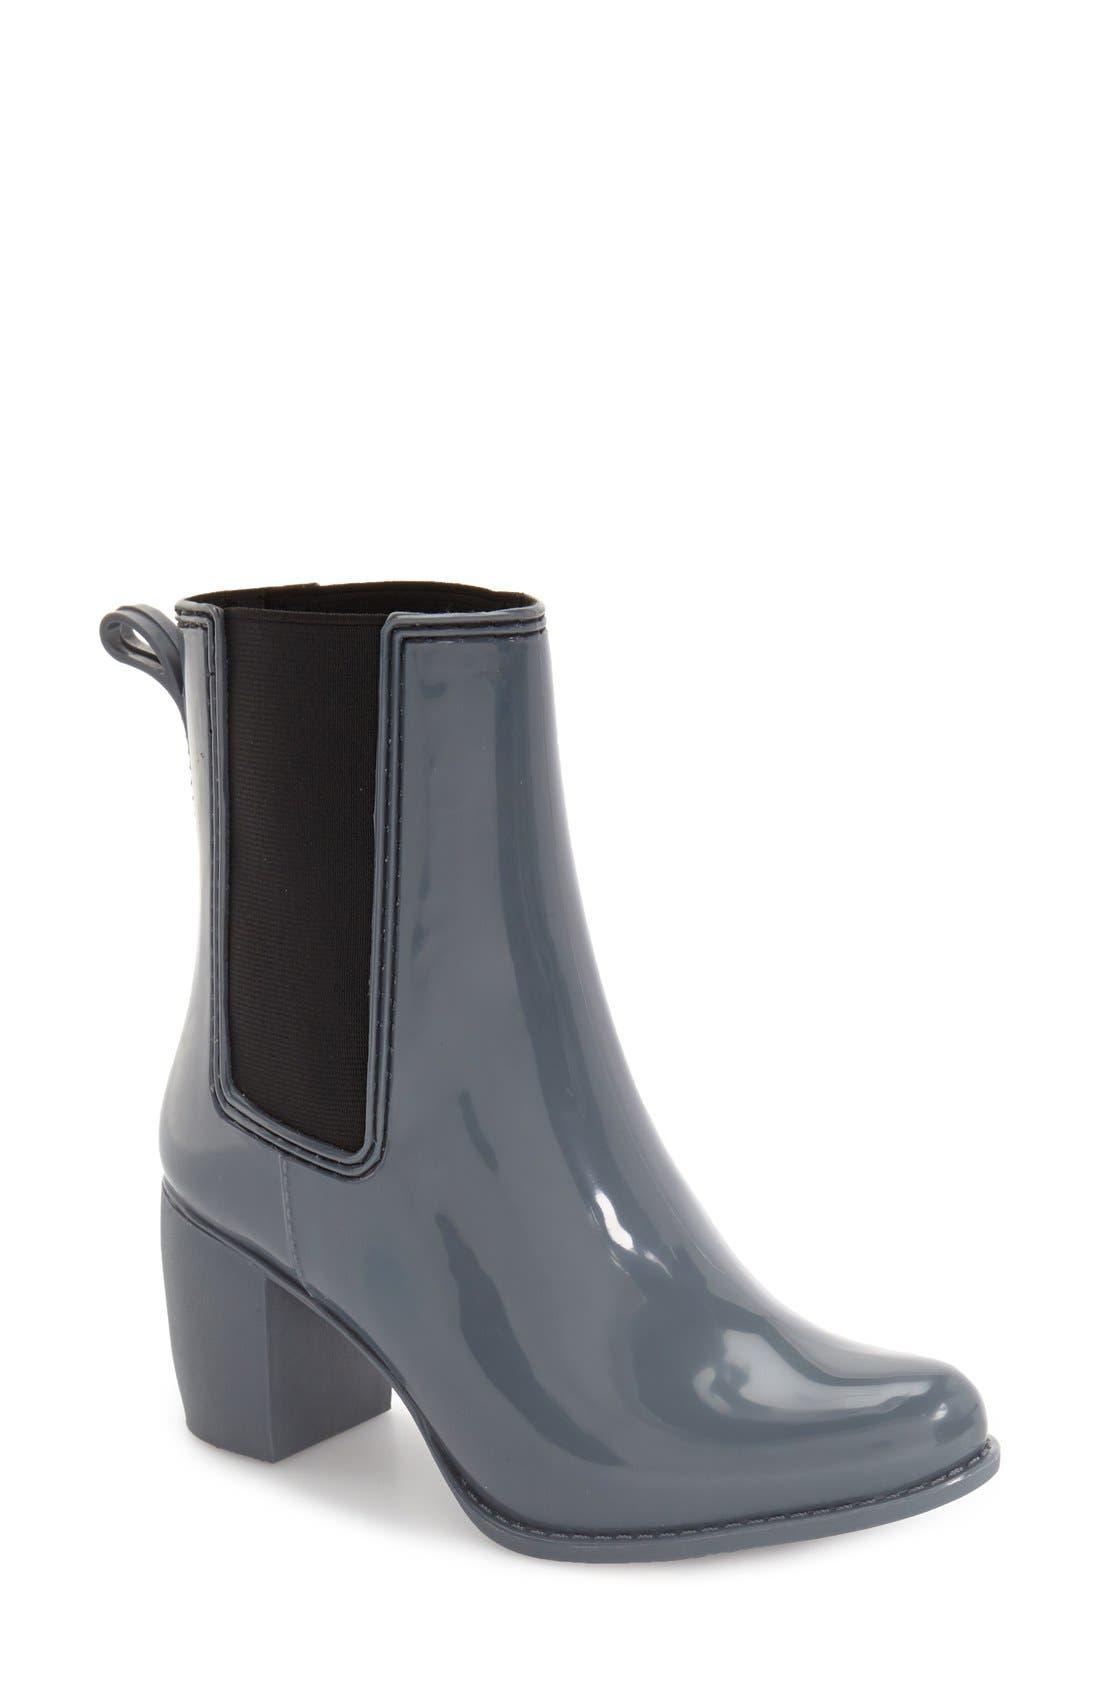 Main Image - Jeffrey Campbell 'Clima' Chelsea Rain Boot (Women)